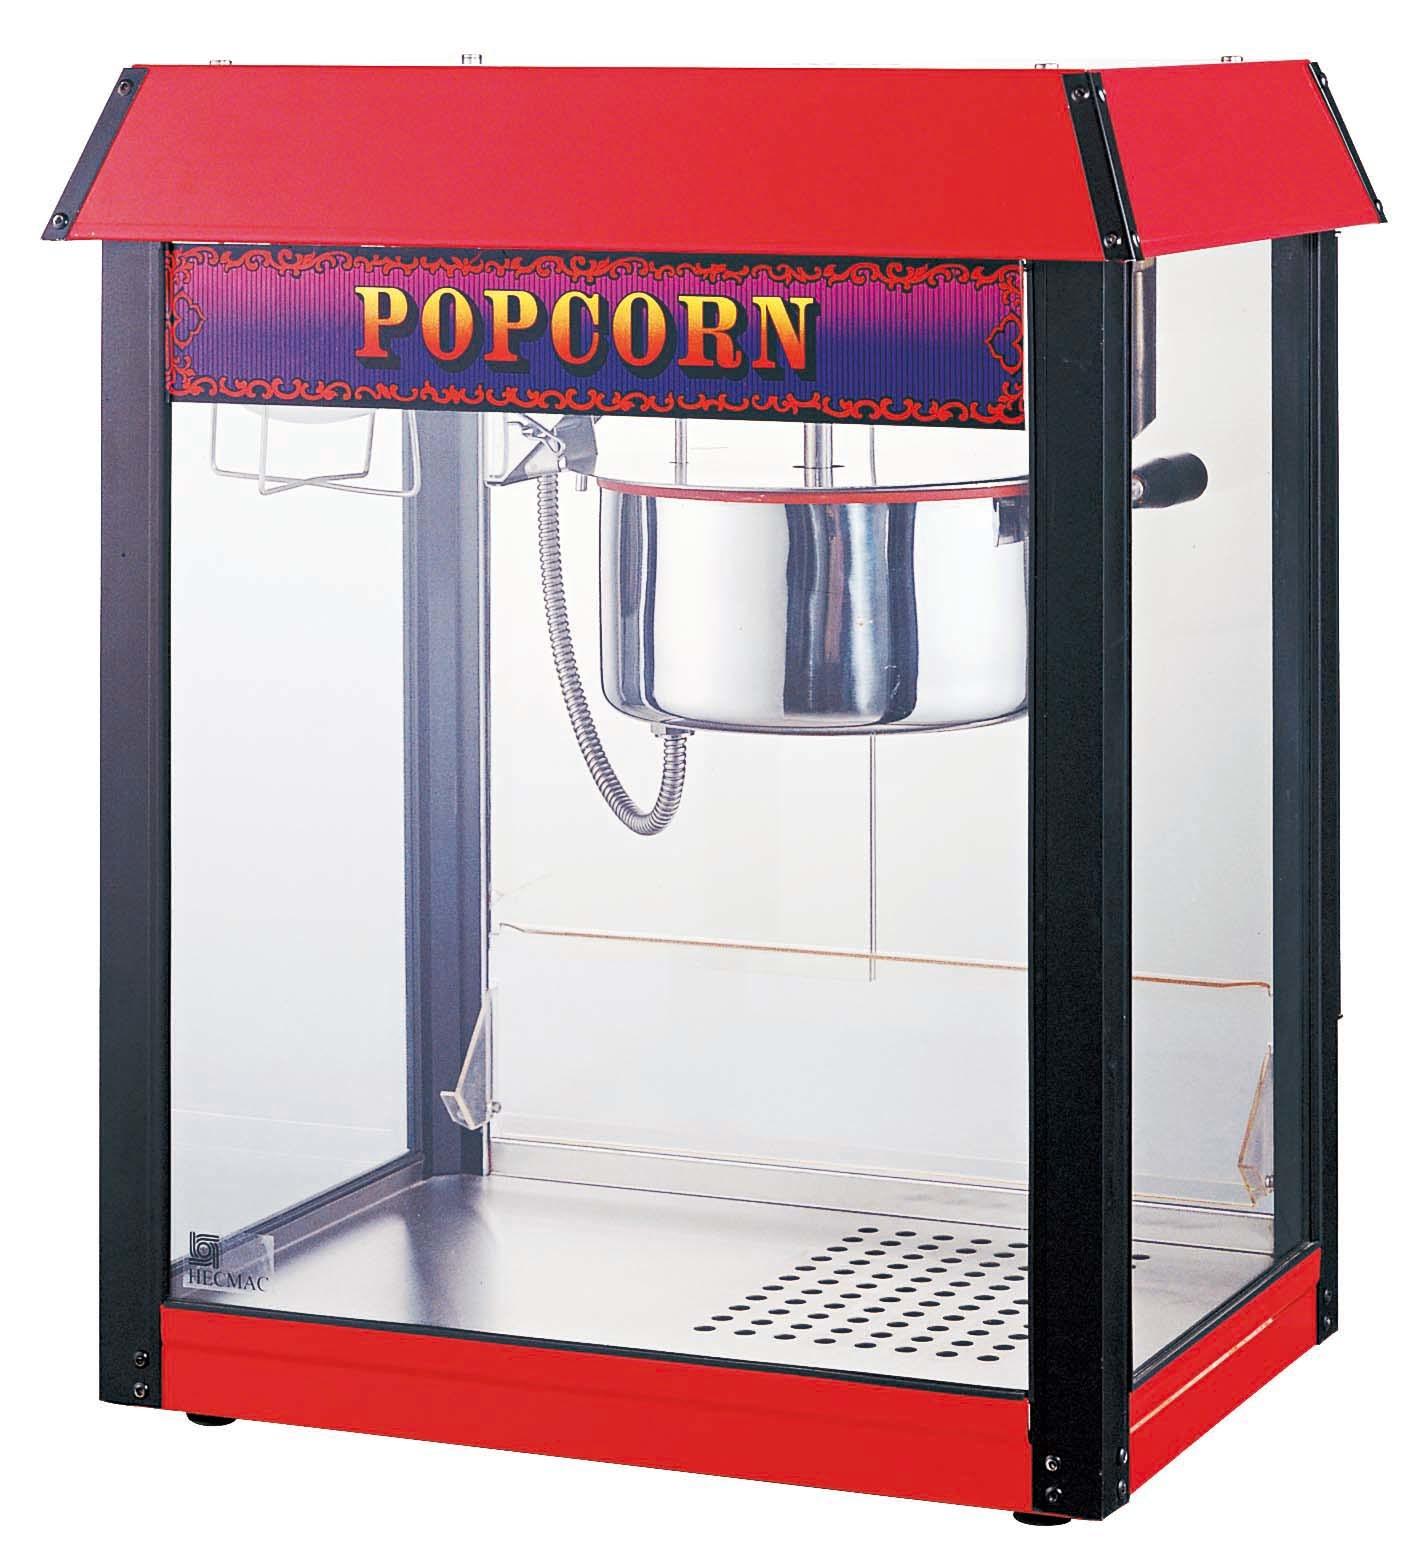 Popcorn Machine (FEHCF104)